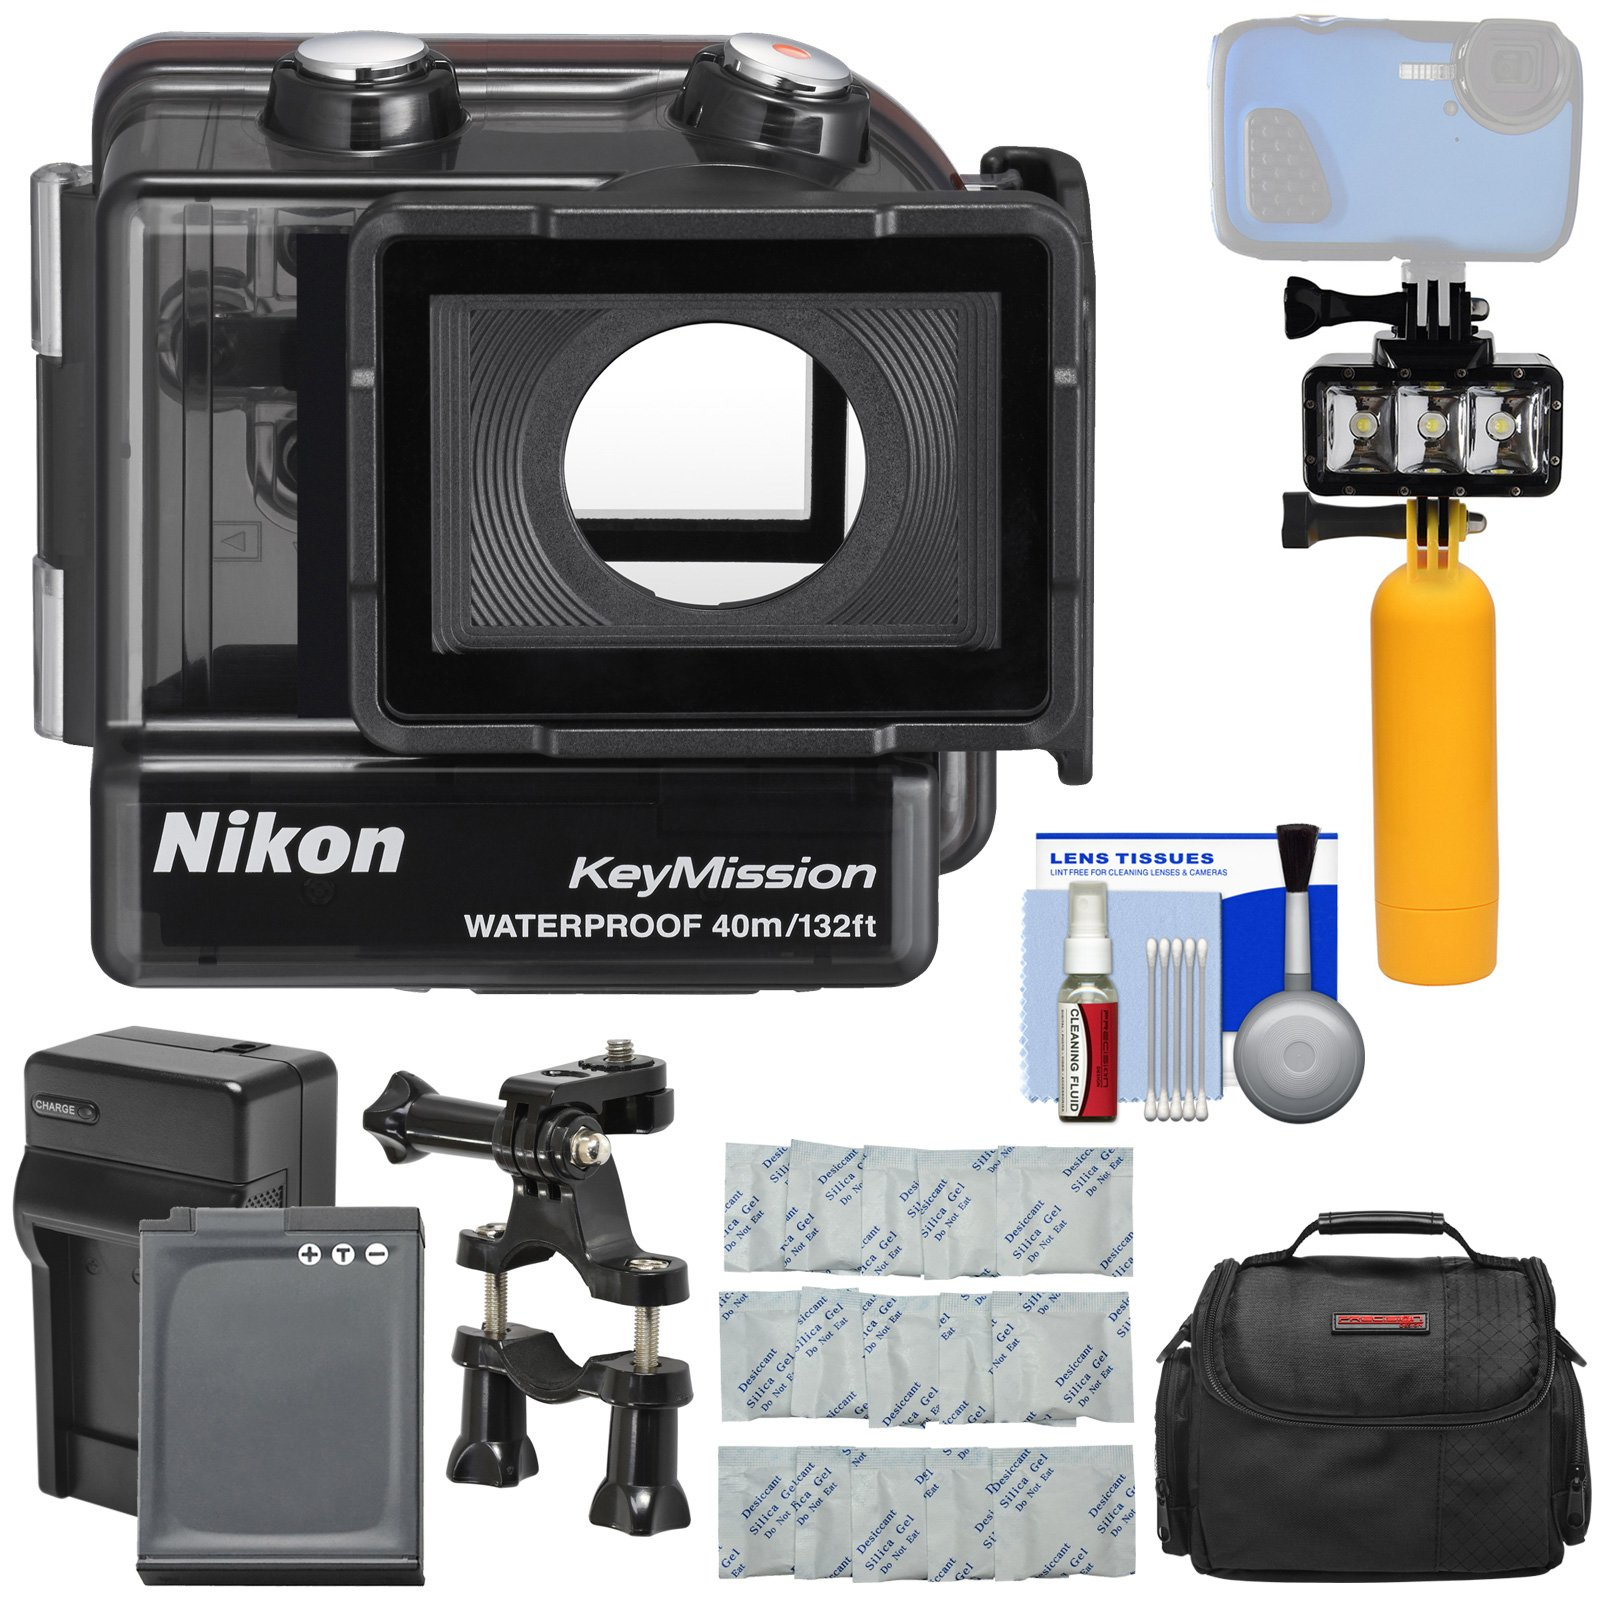 Nikon WP-AA1 Waterproof Case for KeyMission 170 with Case + EN-EL12 Battery & Charger + Underwater Video Light + Float Handle + Bike Mount + Kit by Nikon